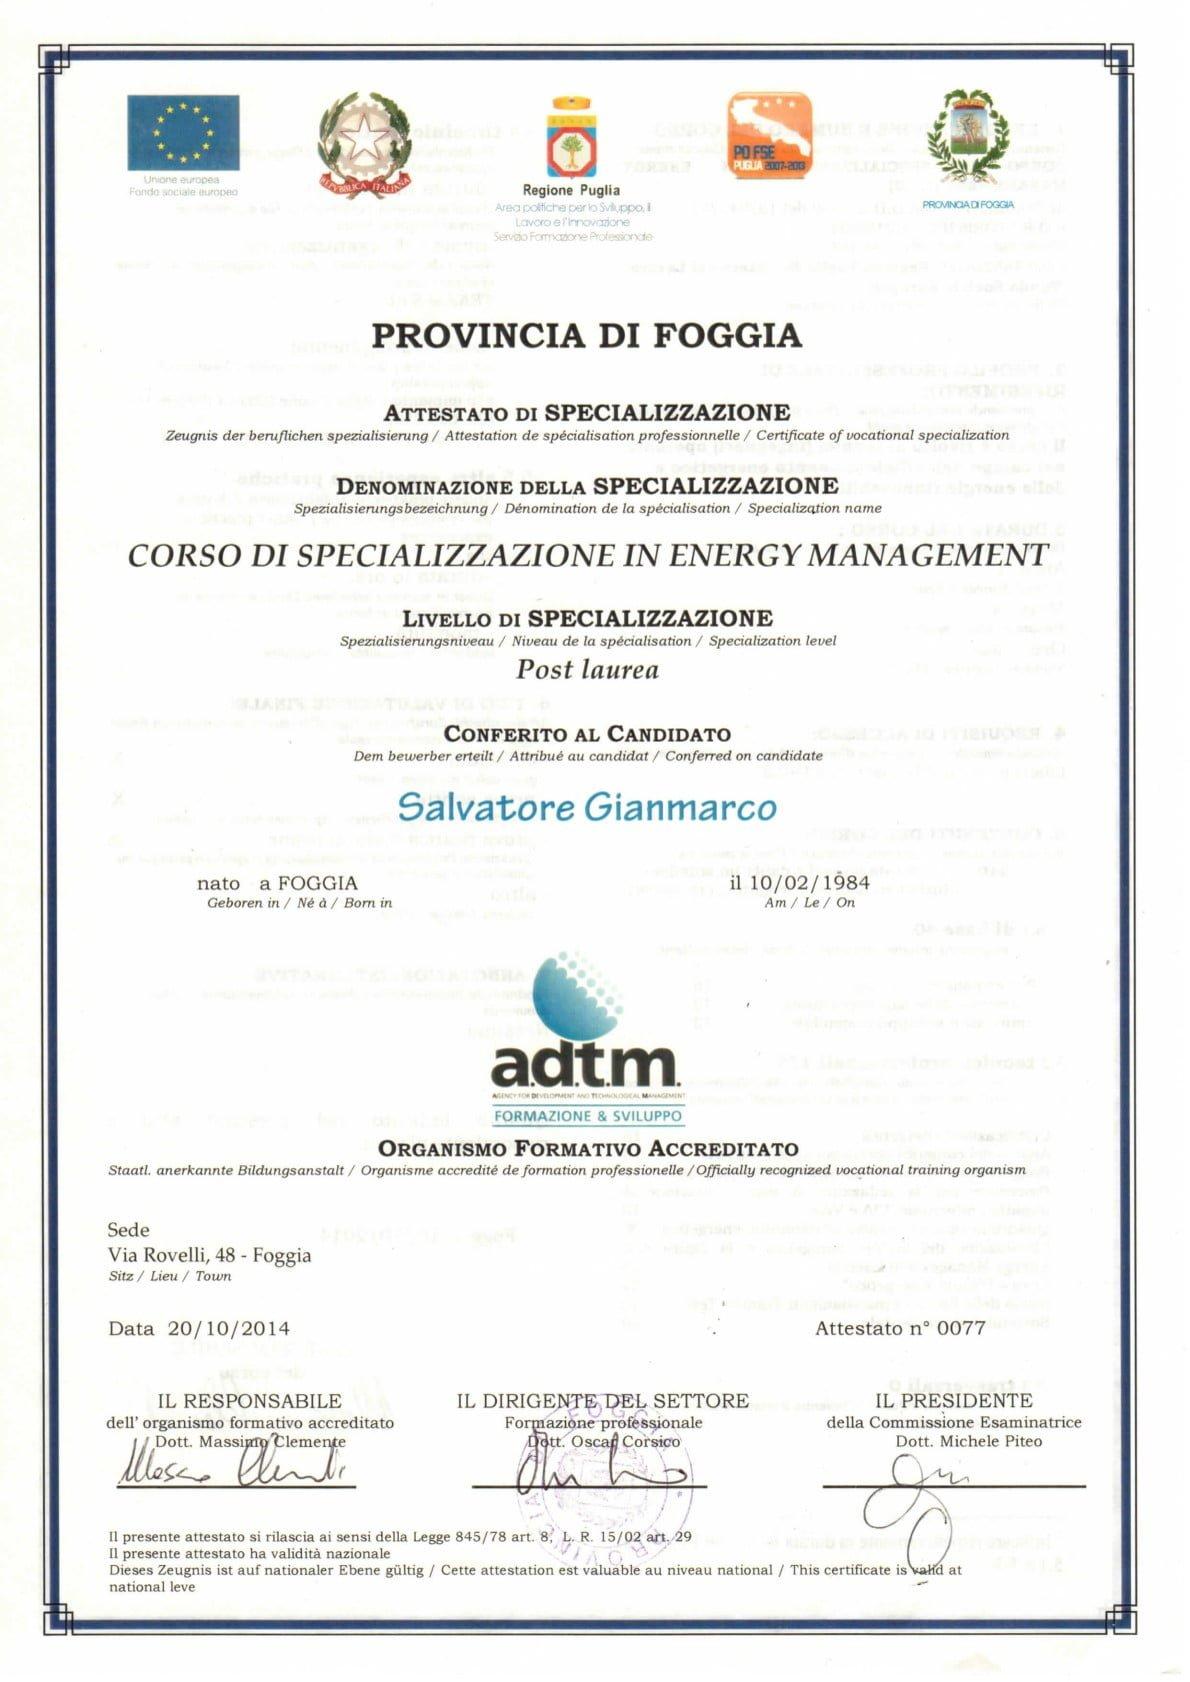 Specializzazione in Energy Management